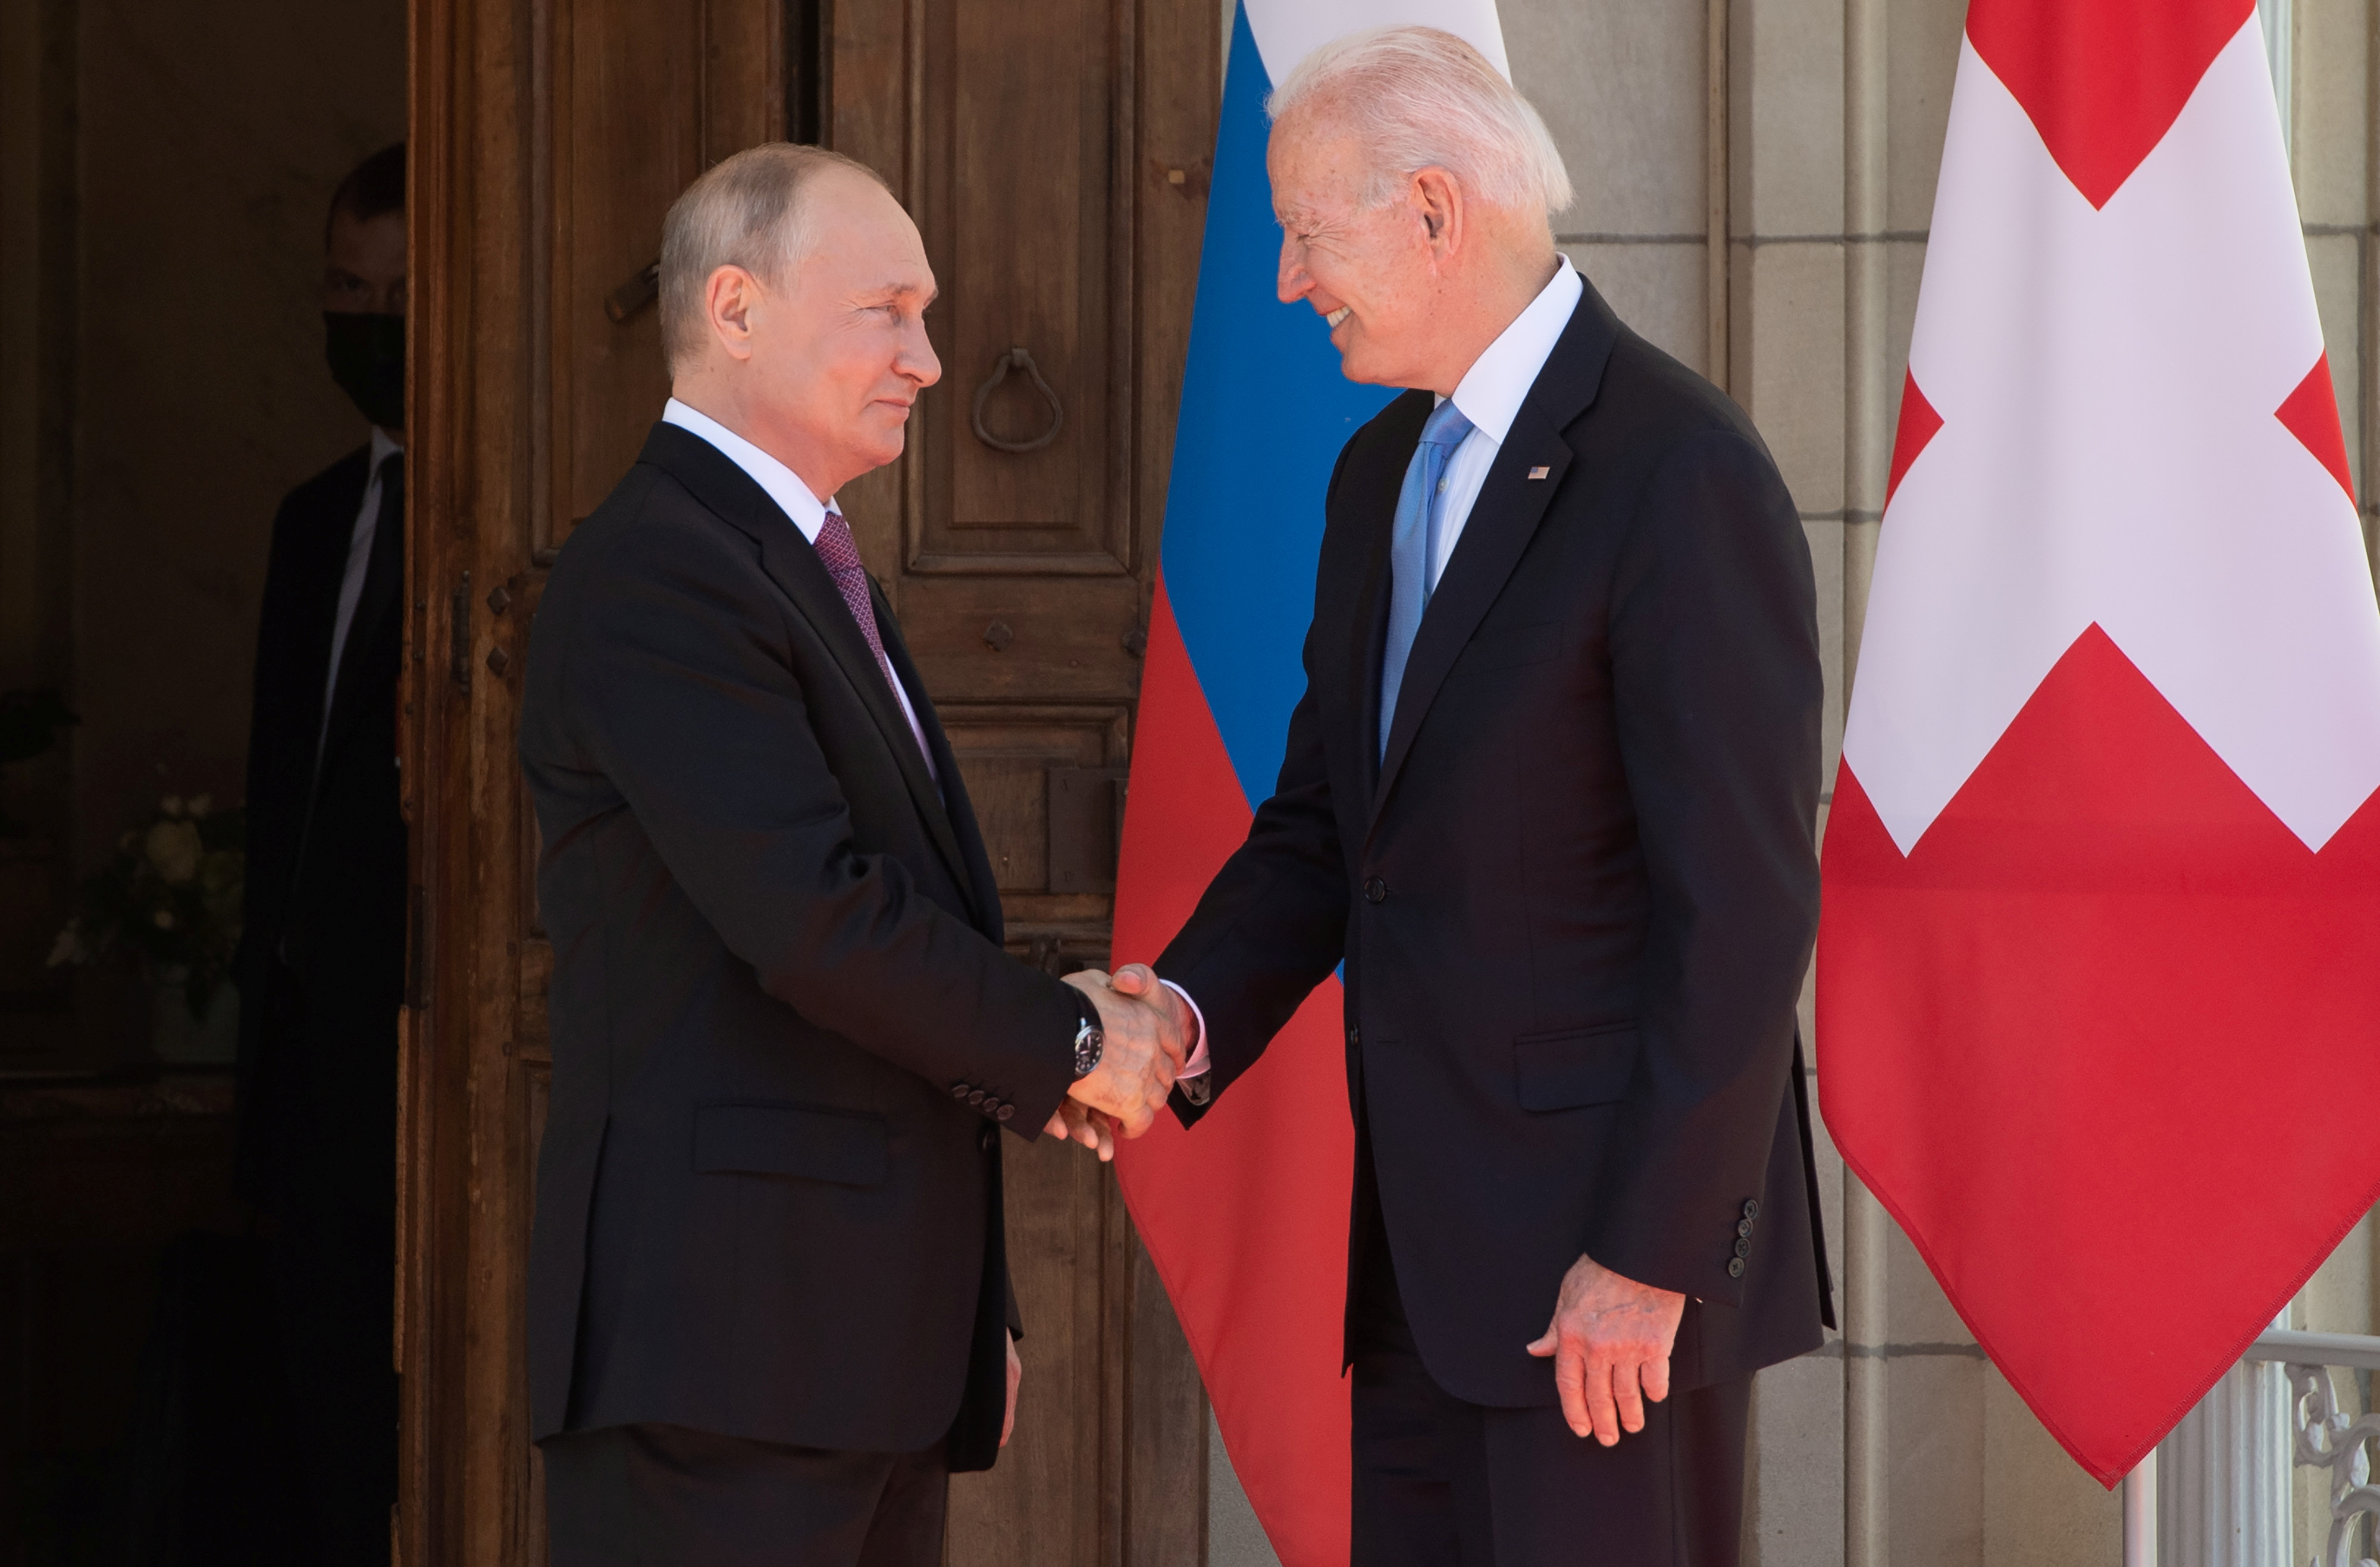 U.S. President Joe Biden and Russia's President Vladimir Putin shake hands as they arrive for the U.S.-Russia summit at Villa La Grange in Geneva, Switzerland June 16, 2021. Saul Loeb/Pool via REUTERS